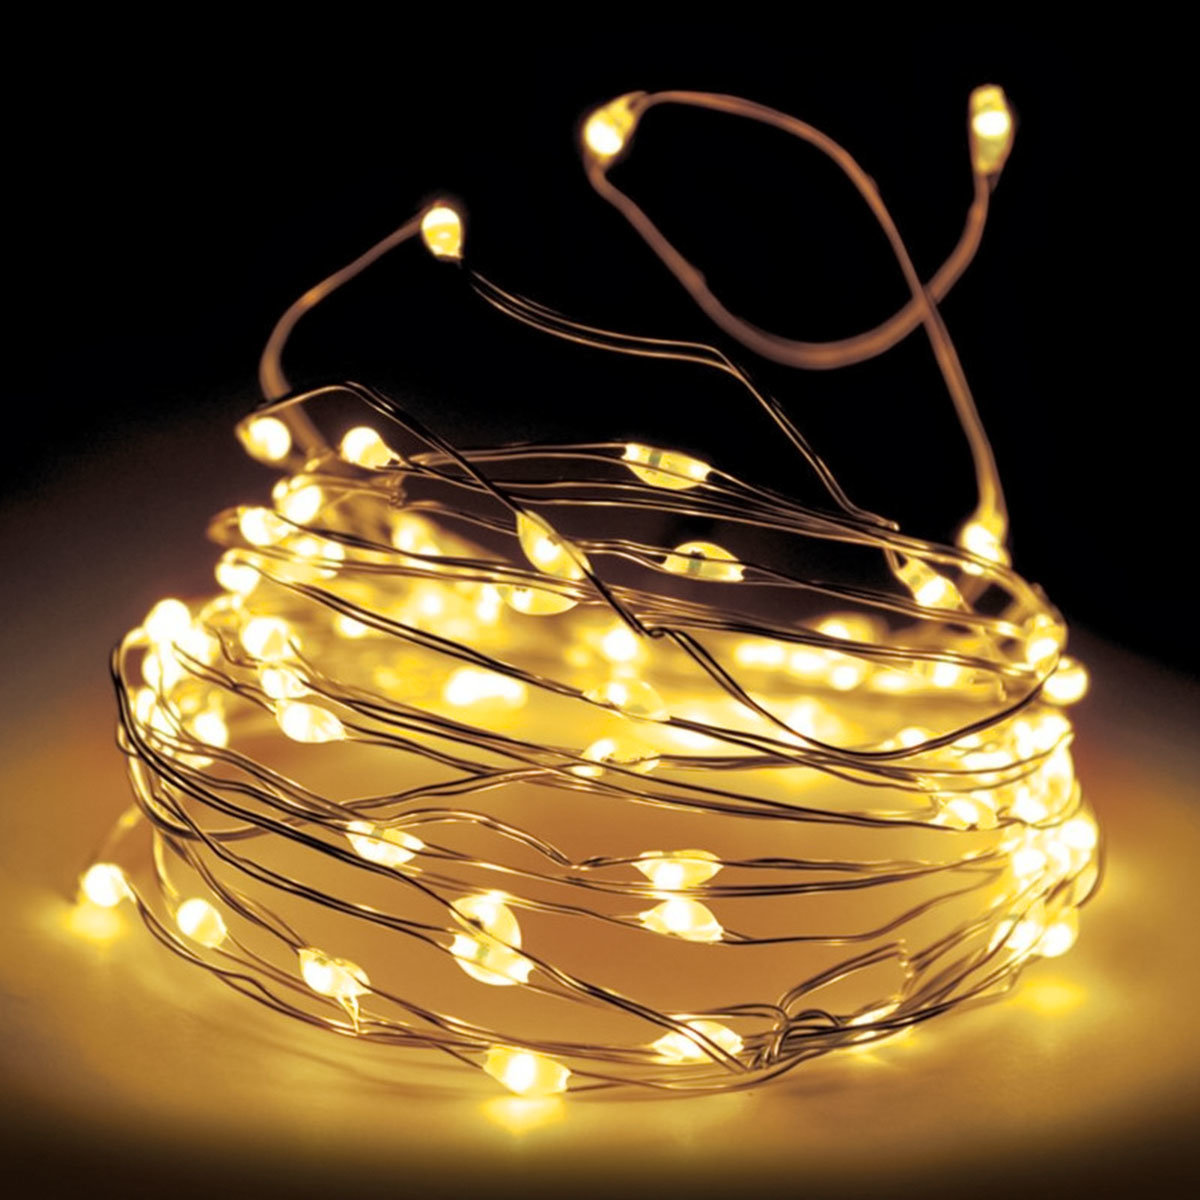 LED-Silberdraht, weiß